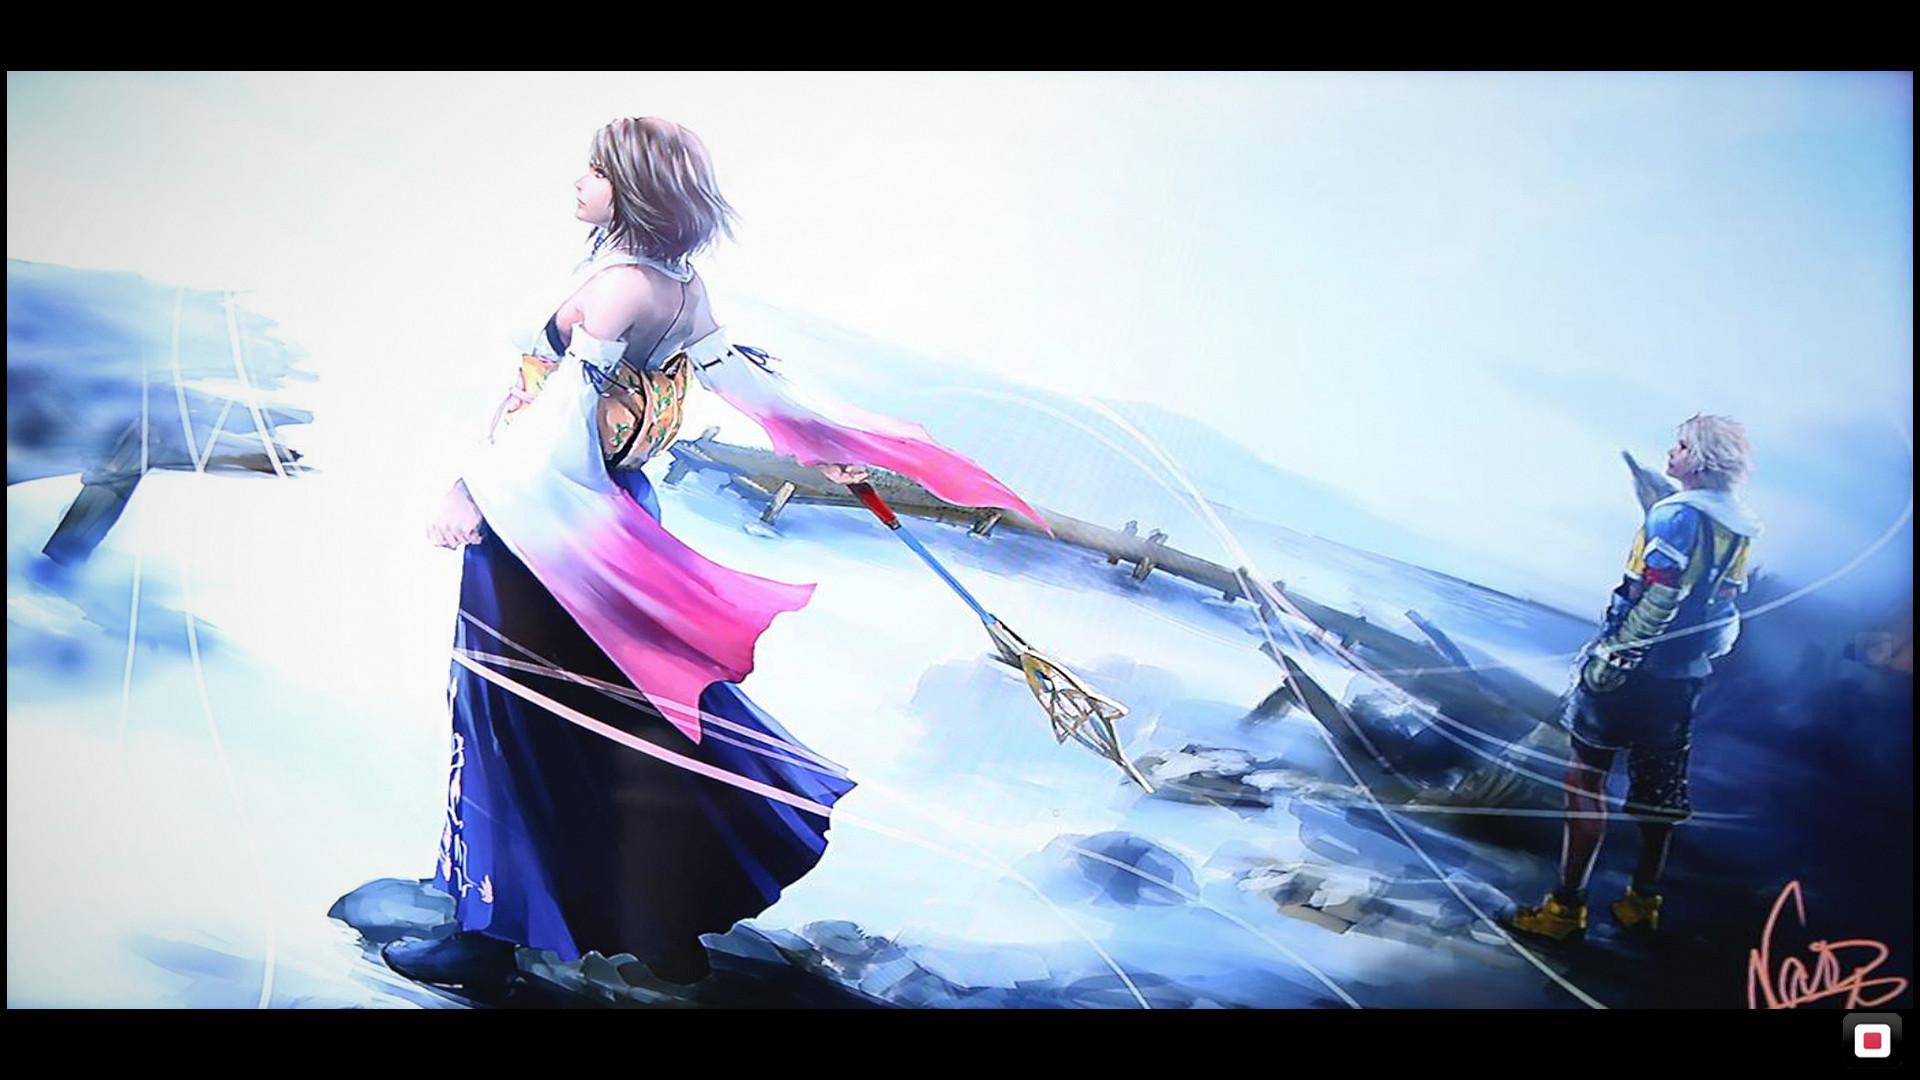 Final Fantasy 10 Wallpaper: Final Fantasy X HD Wallpaper (86+ Images